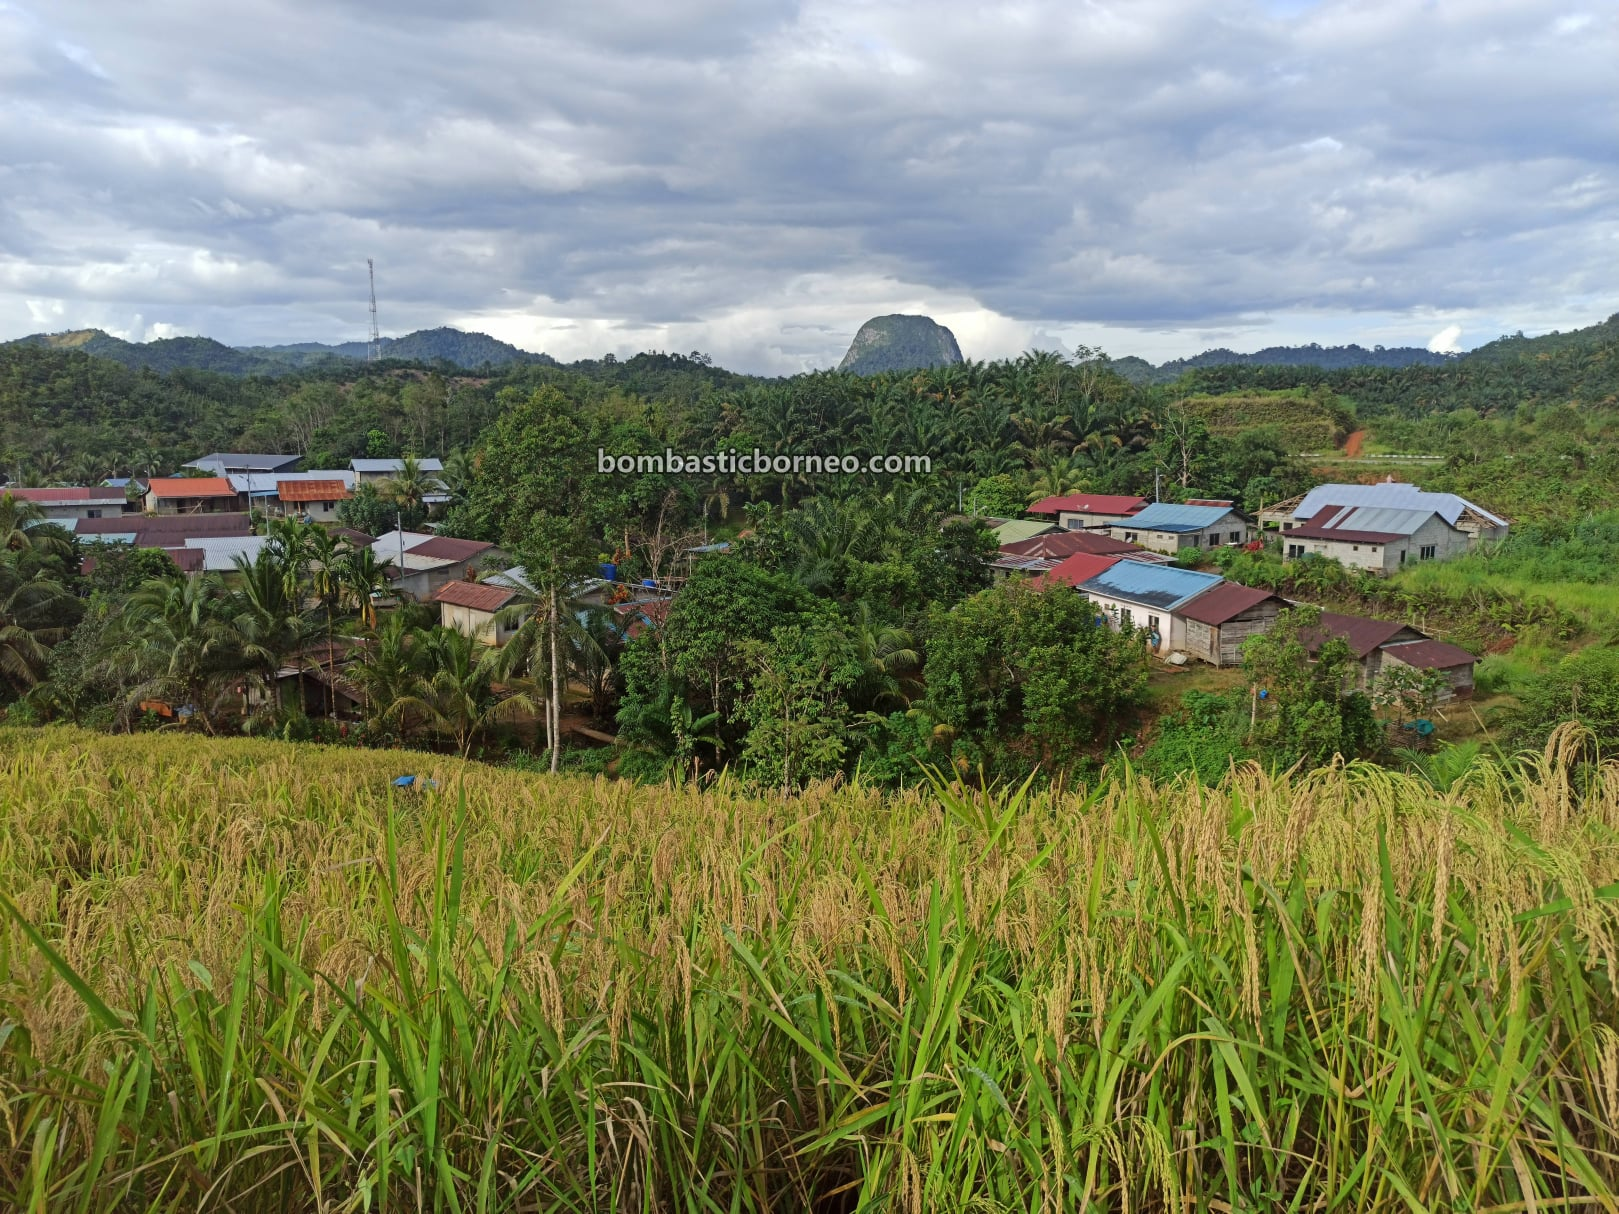 Village, hill paddy, padi gunung, authentic, Traditional, dayak bidayuh, native, exploration, Tourism, tourist attraction, travel local, Trans Borneo, 穿越婆罗洲游踪, 马来西亚砂拉越, 西连稻米之乡